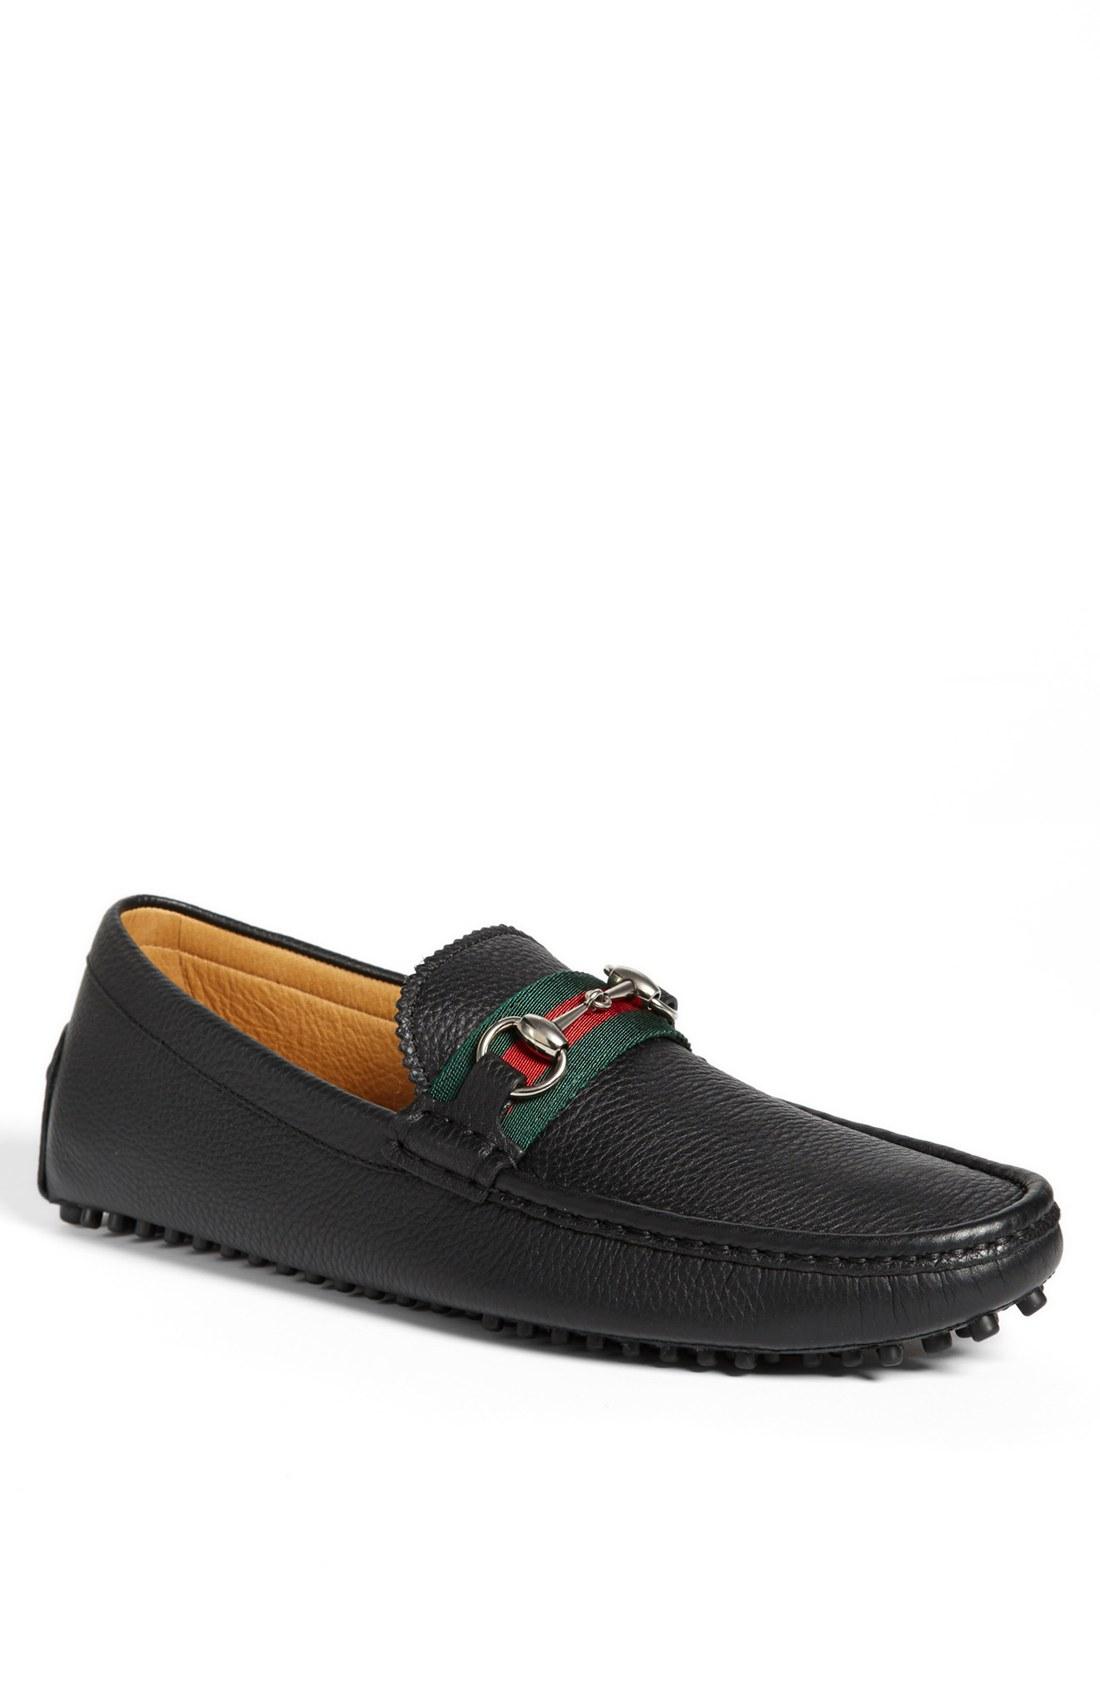 Nordstrom Men S Driving Shoes